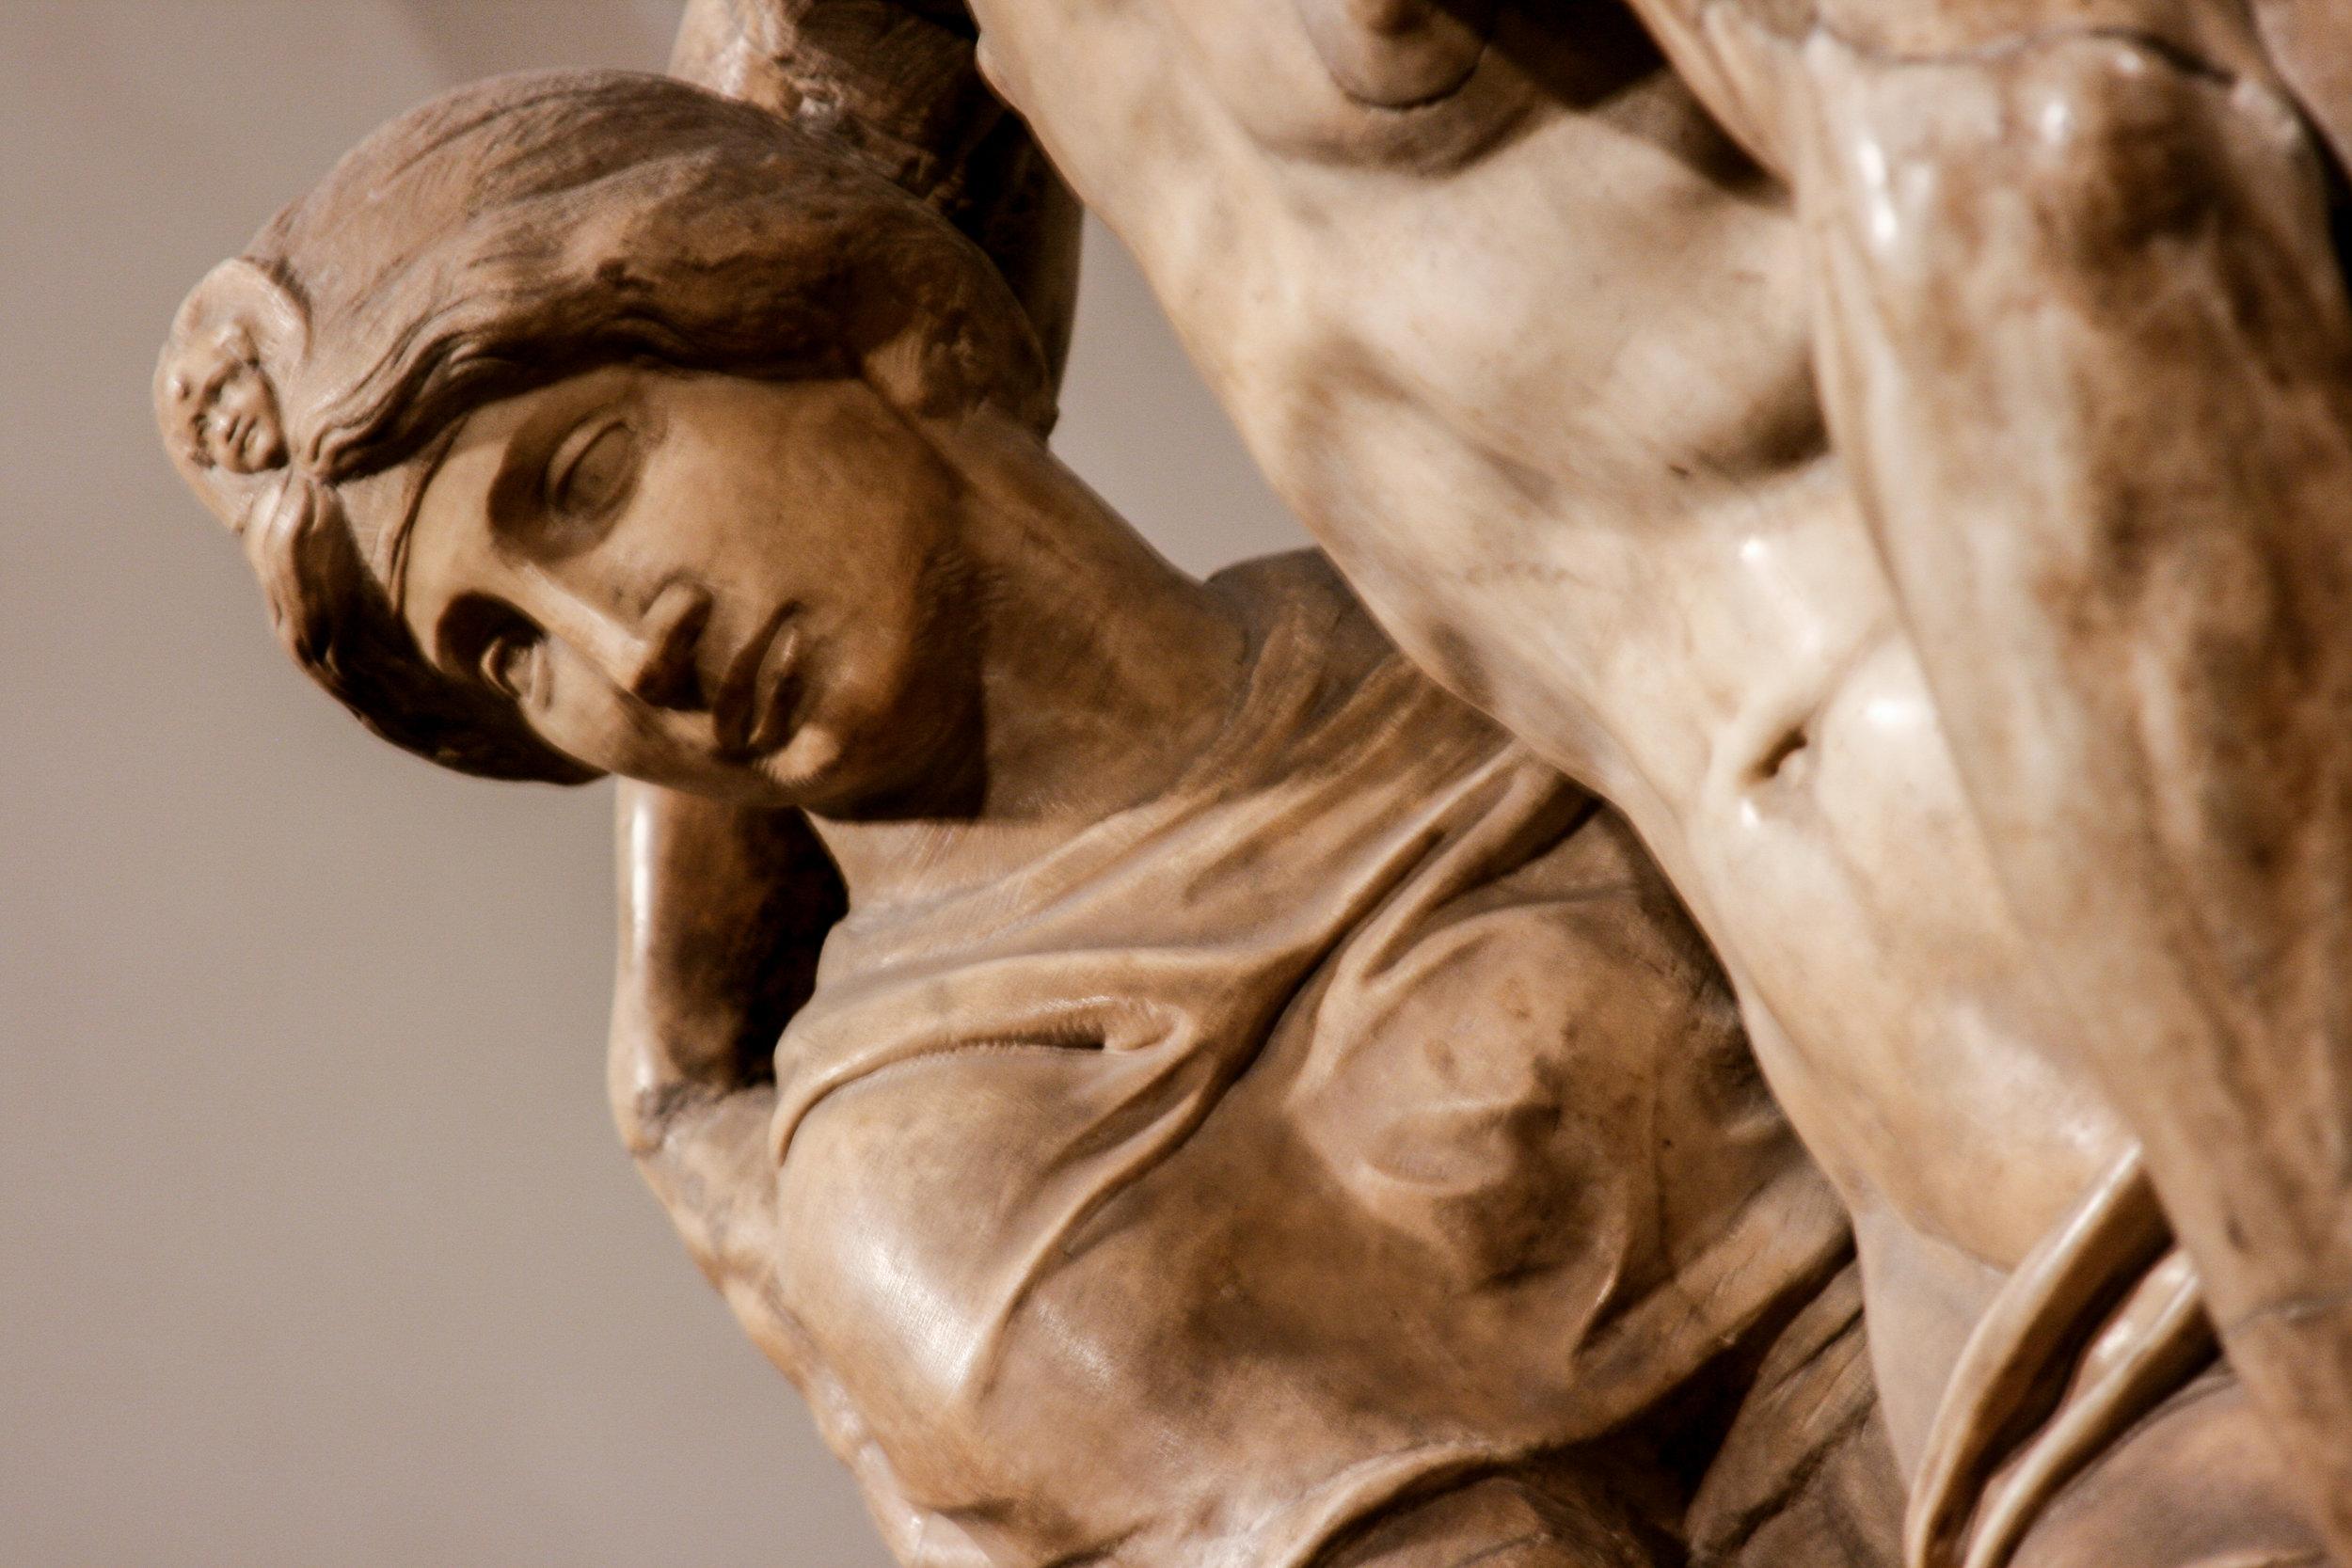 Portrait of Vittoria Colonna, Michelangelo's dear friend, as Mary Magdalene